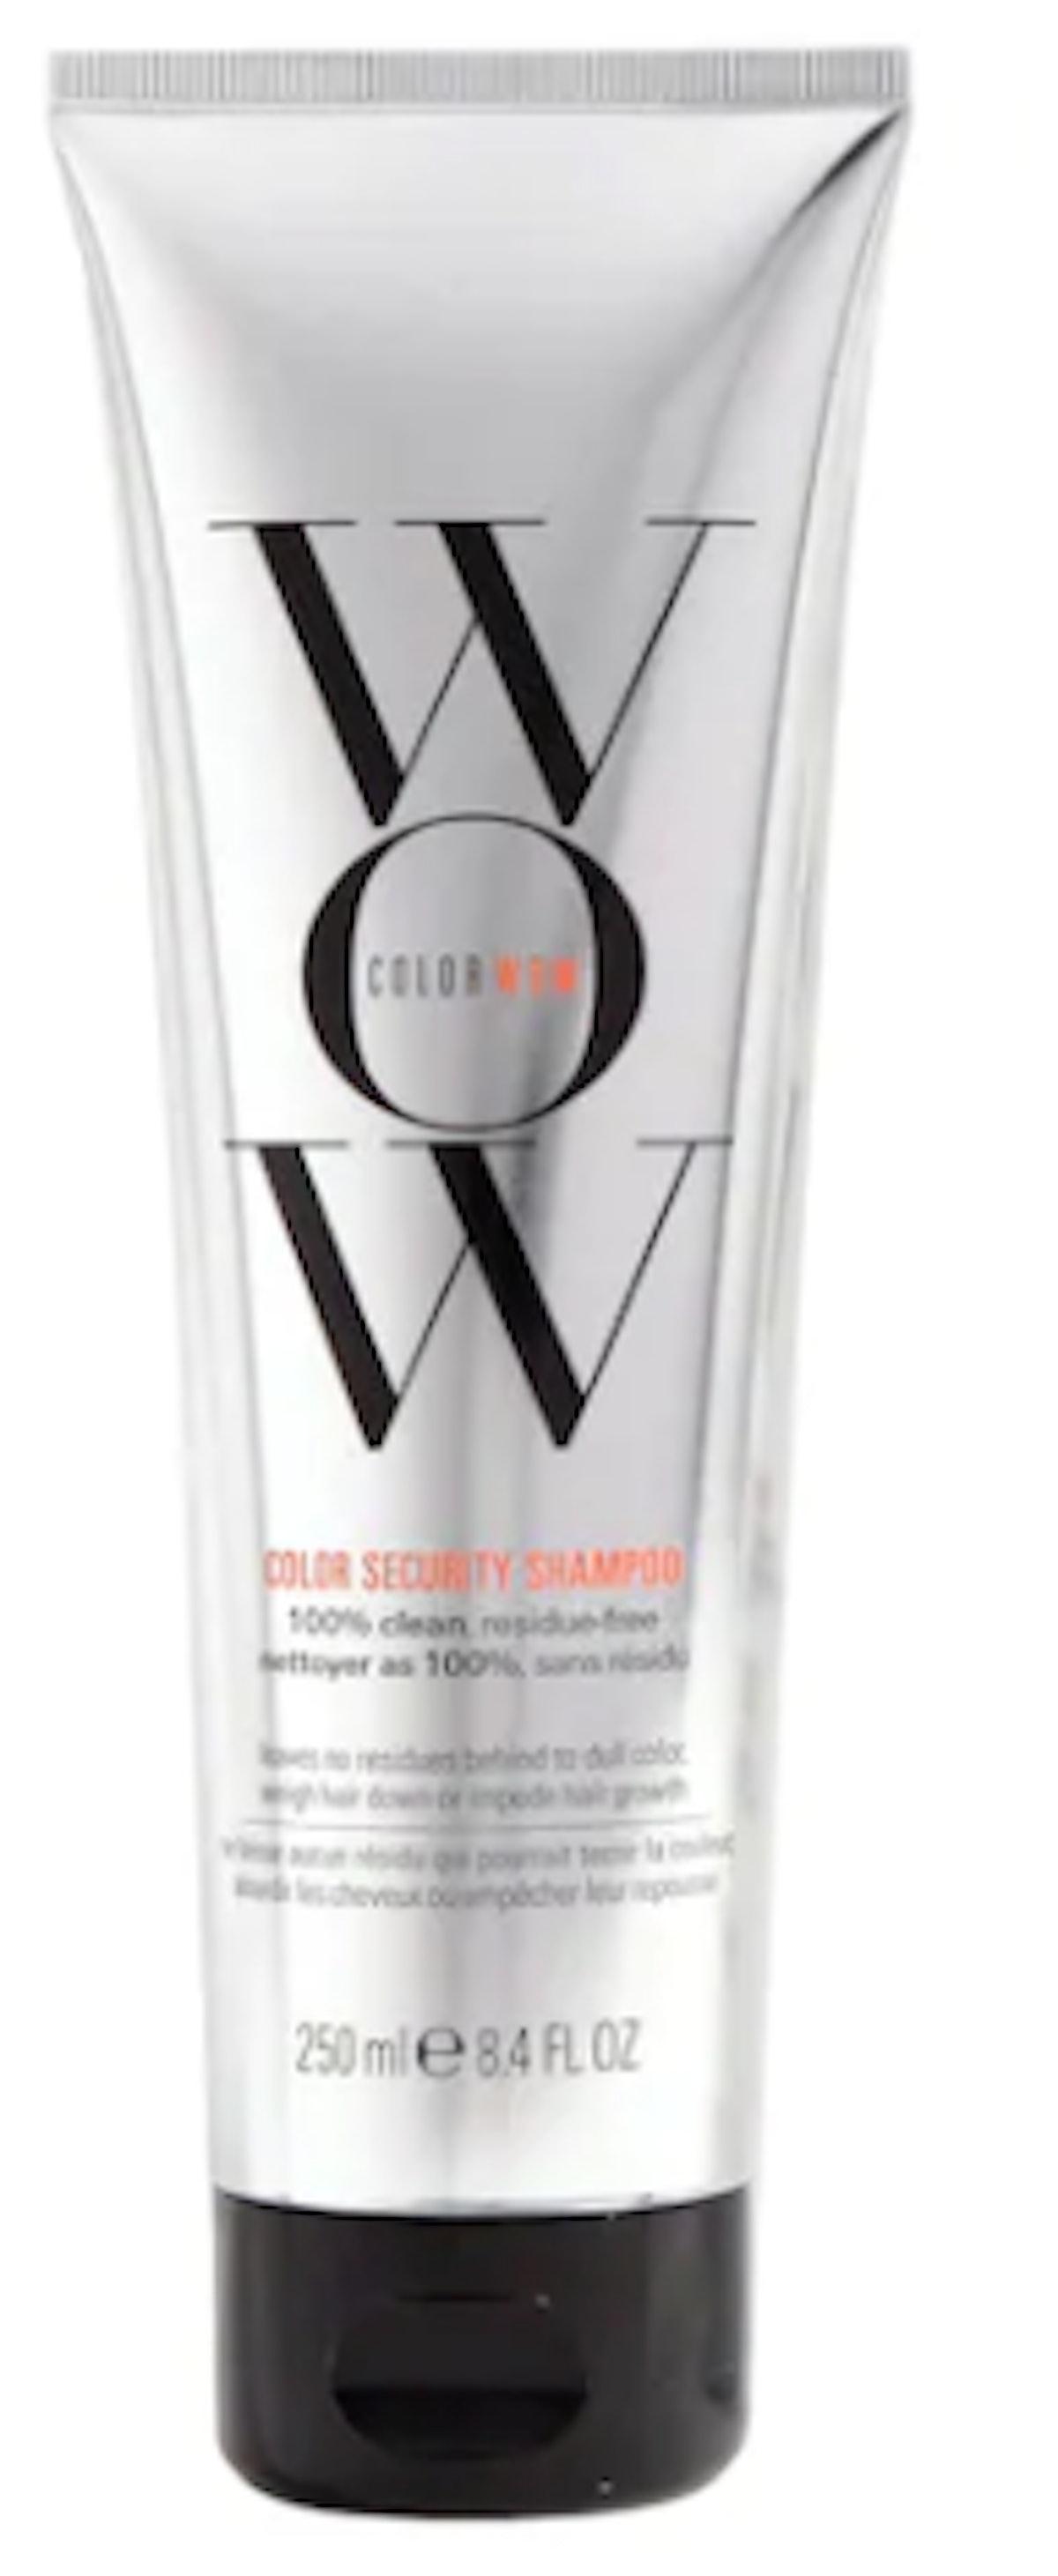 Color Security Shampoo